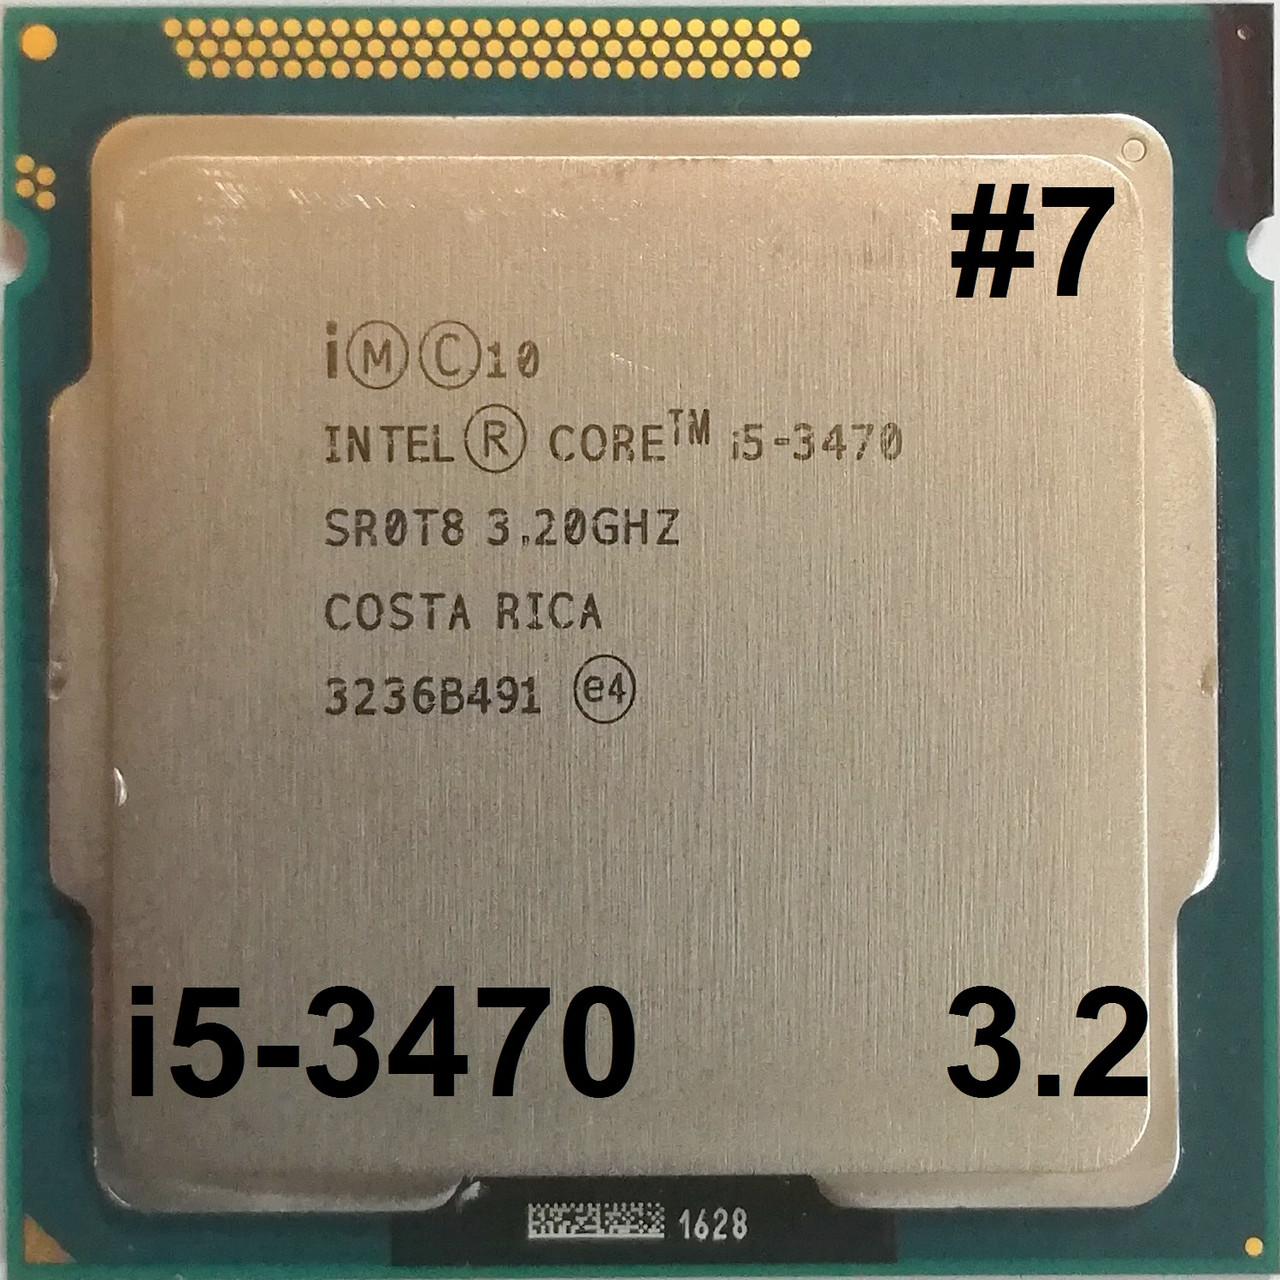 Процессор ЛОТ #7 Intel Core i5-3470 N0 SR0T8 3.2GHz up 3.6GHz 6M Cache Socket 1155 Б/У